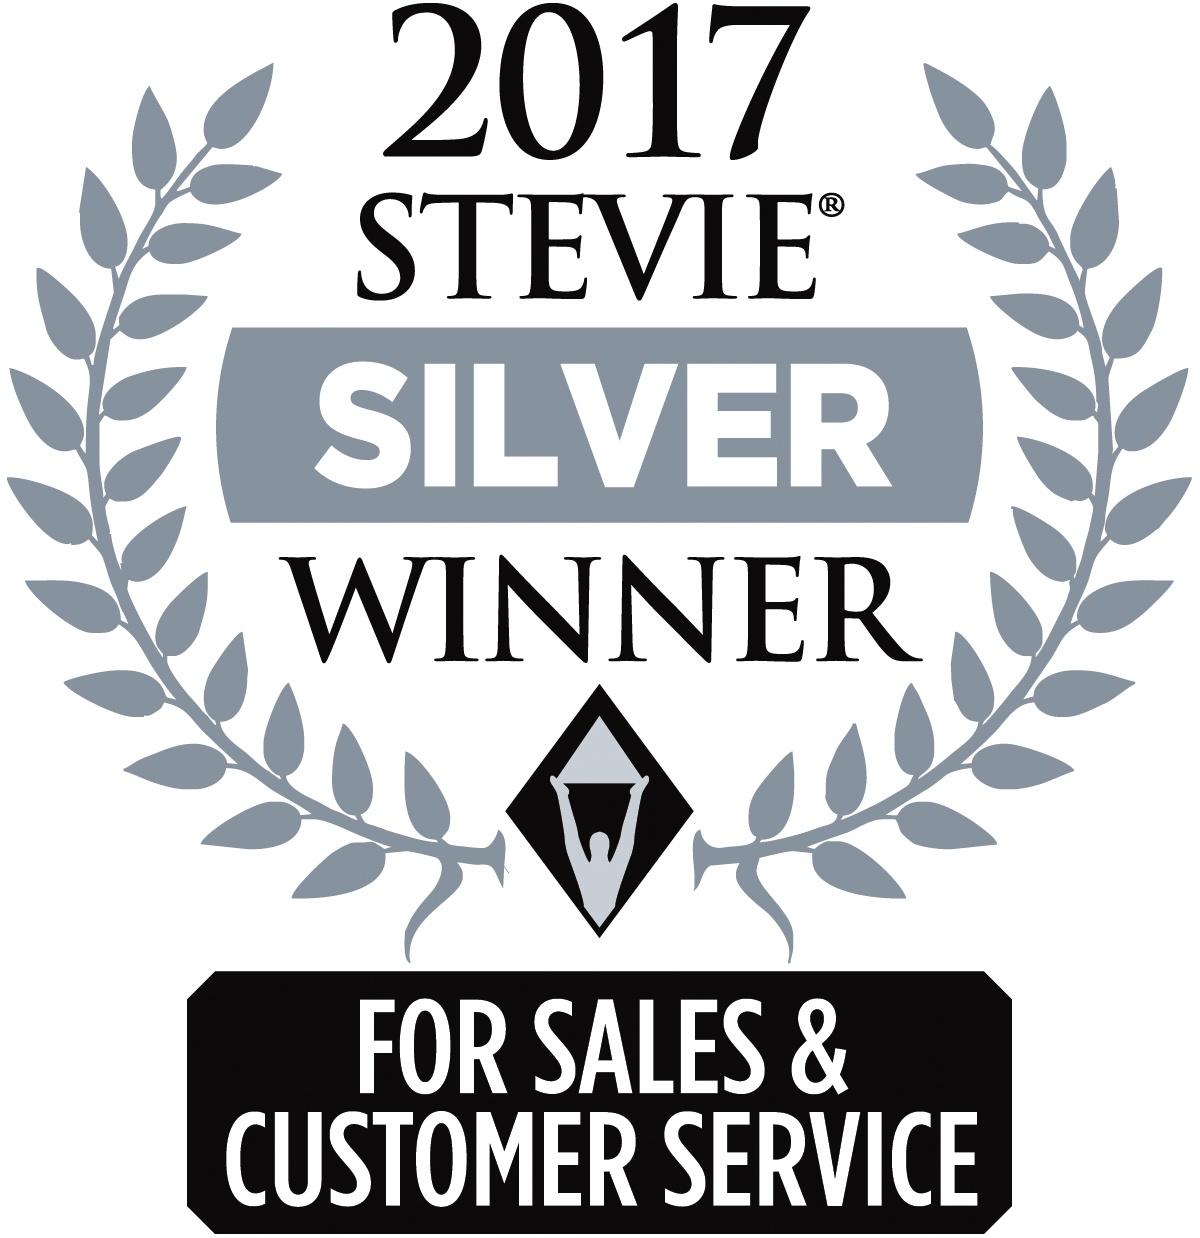 Stevie Award 2017